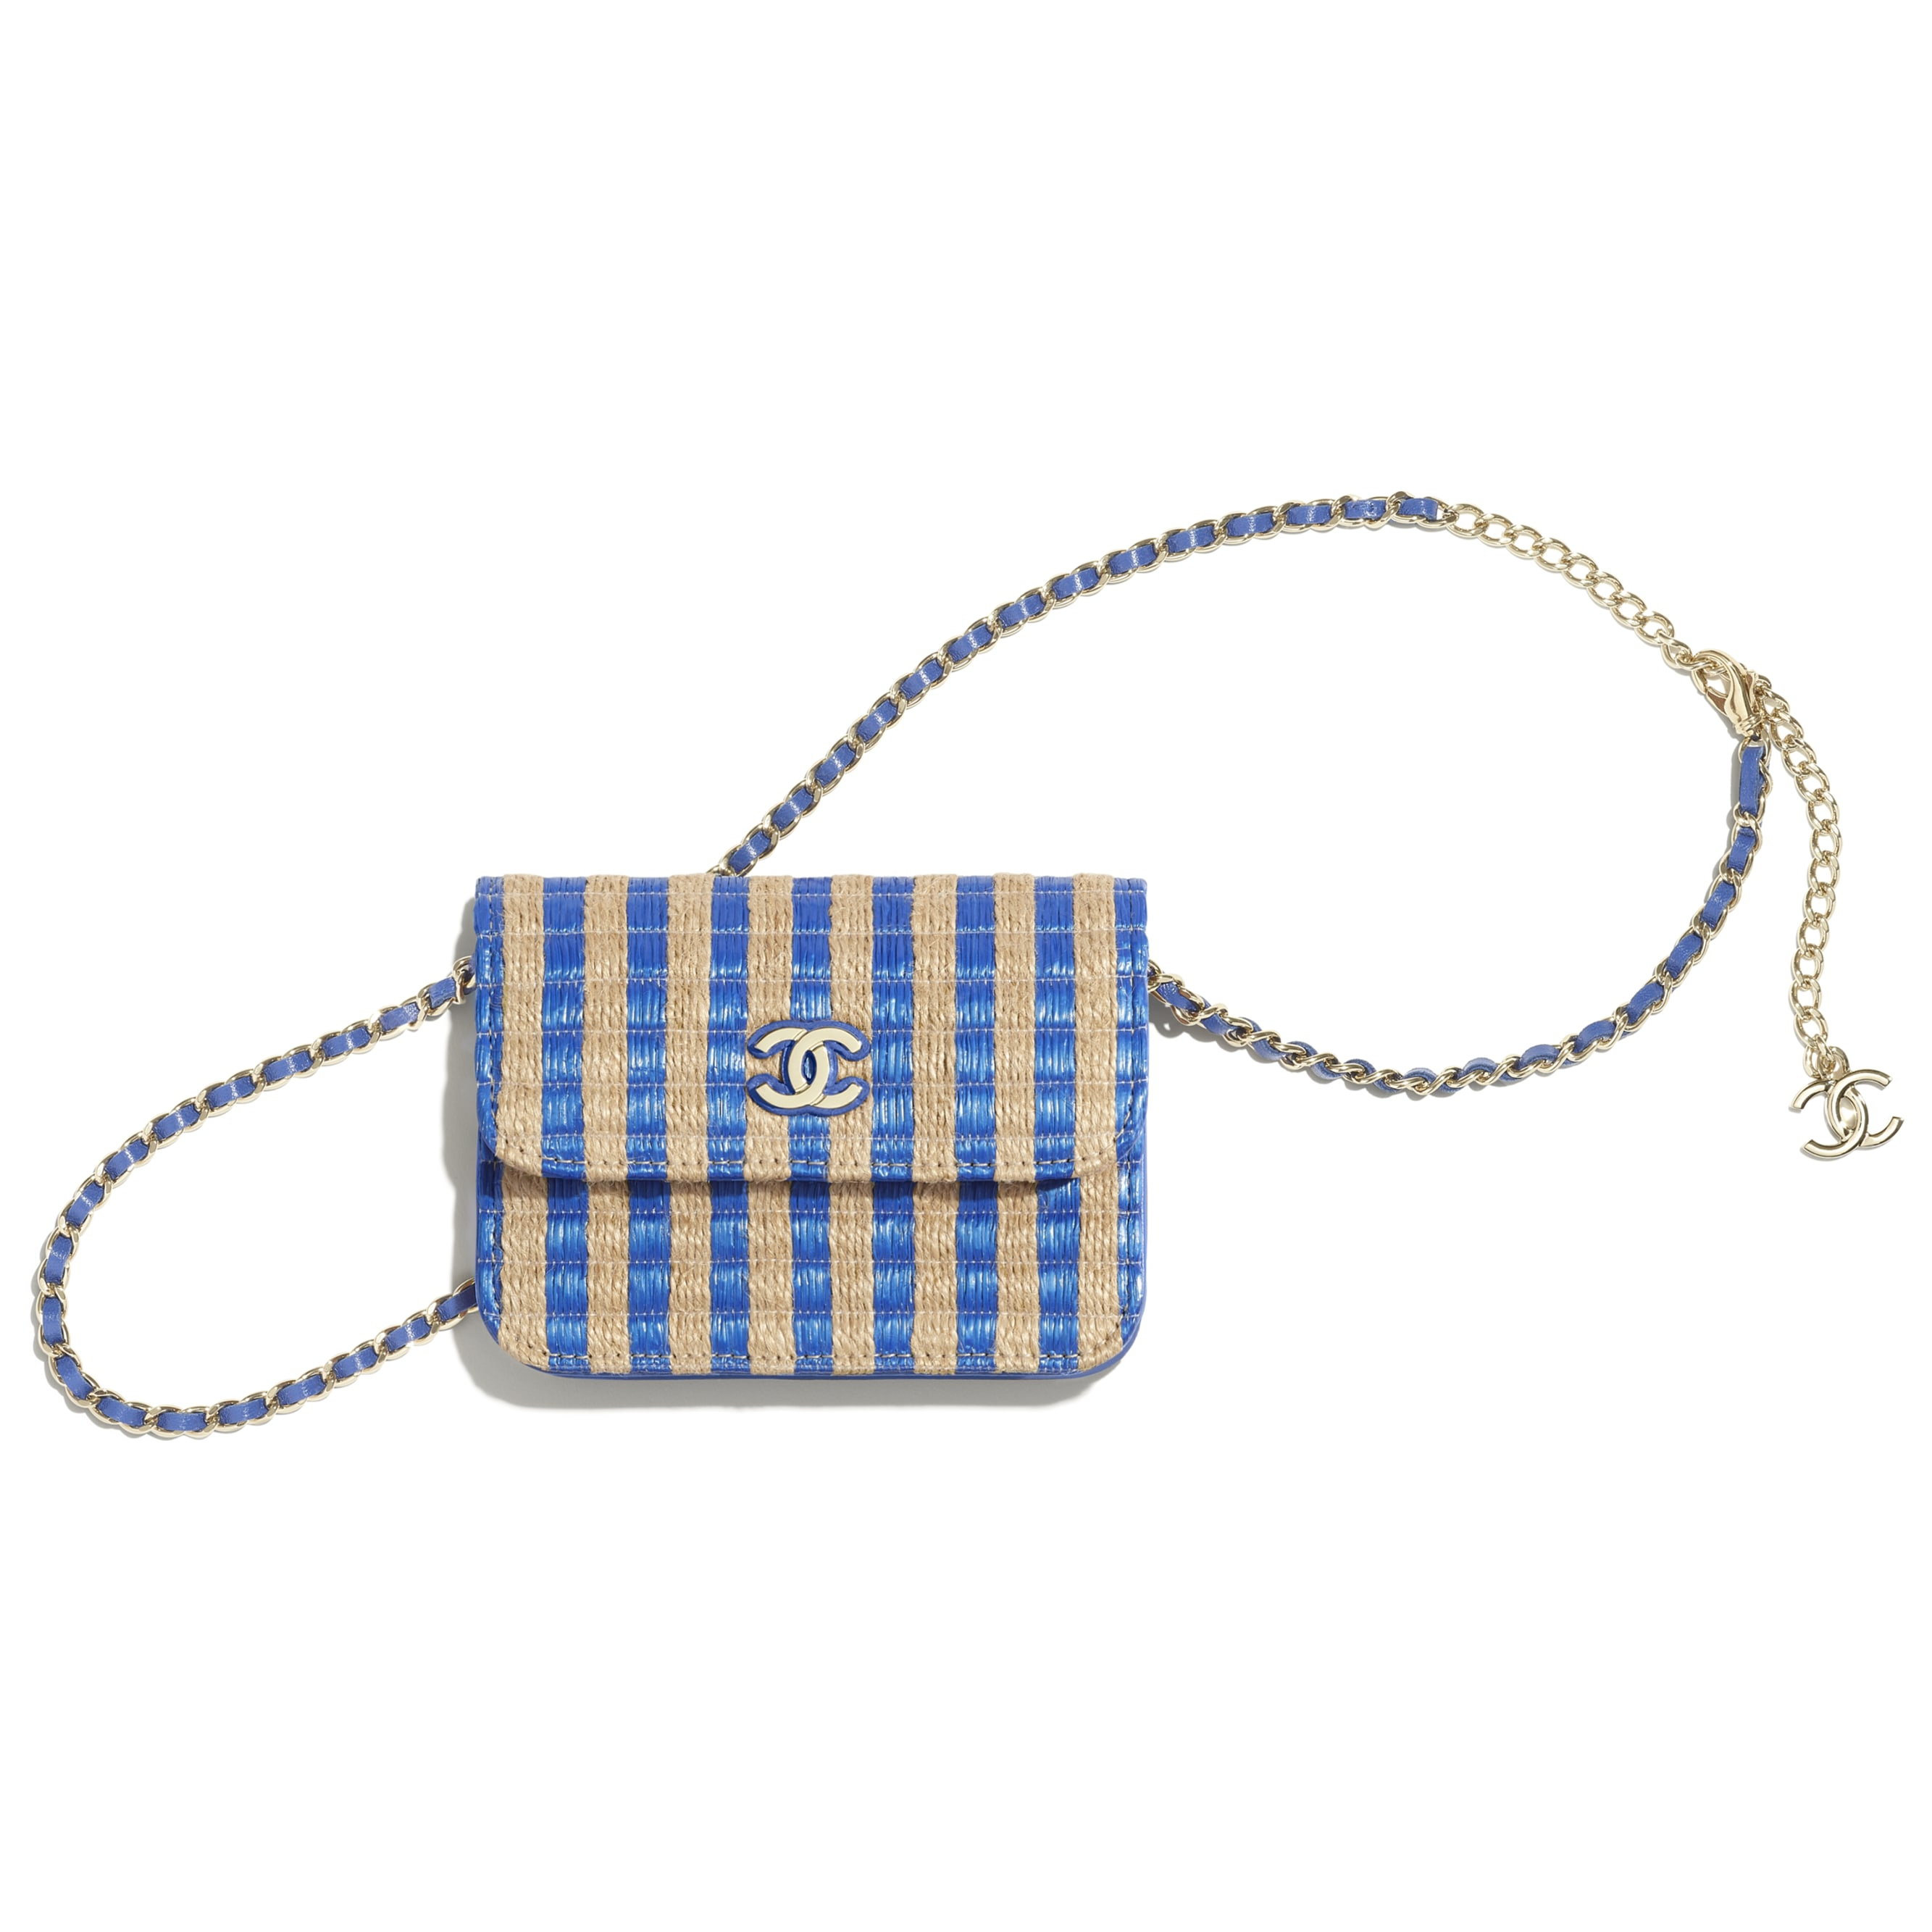 Belt Bag - Blue & Beige - Raffia, Jute Thread & Gold-Tone Metal - CHANEL - Default view - see standard sized version